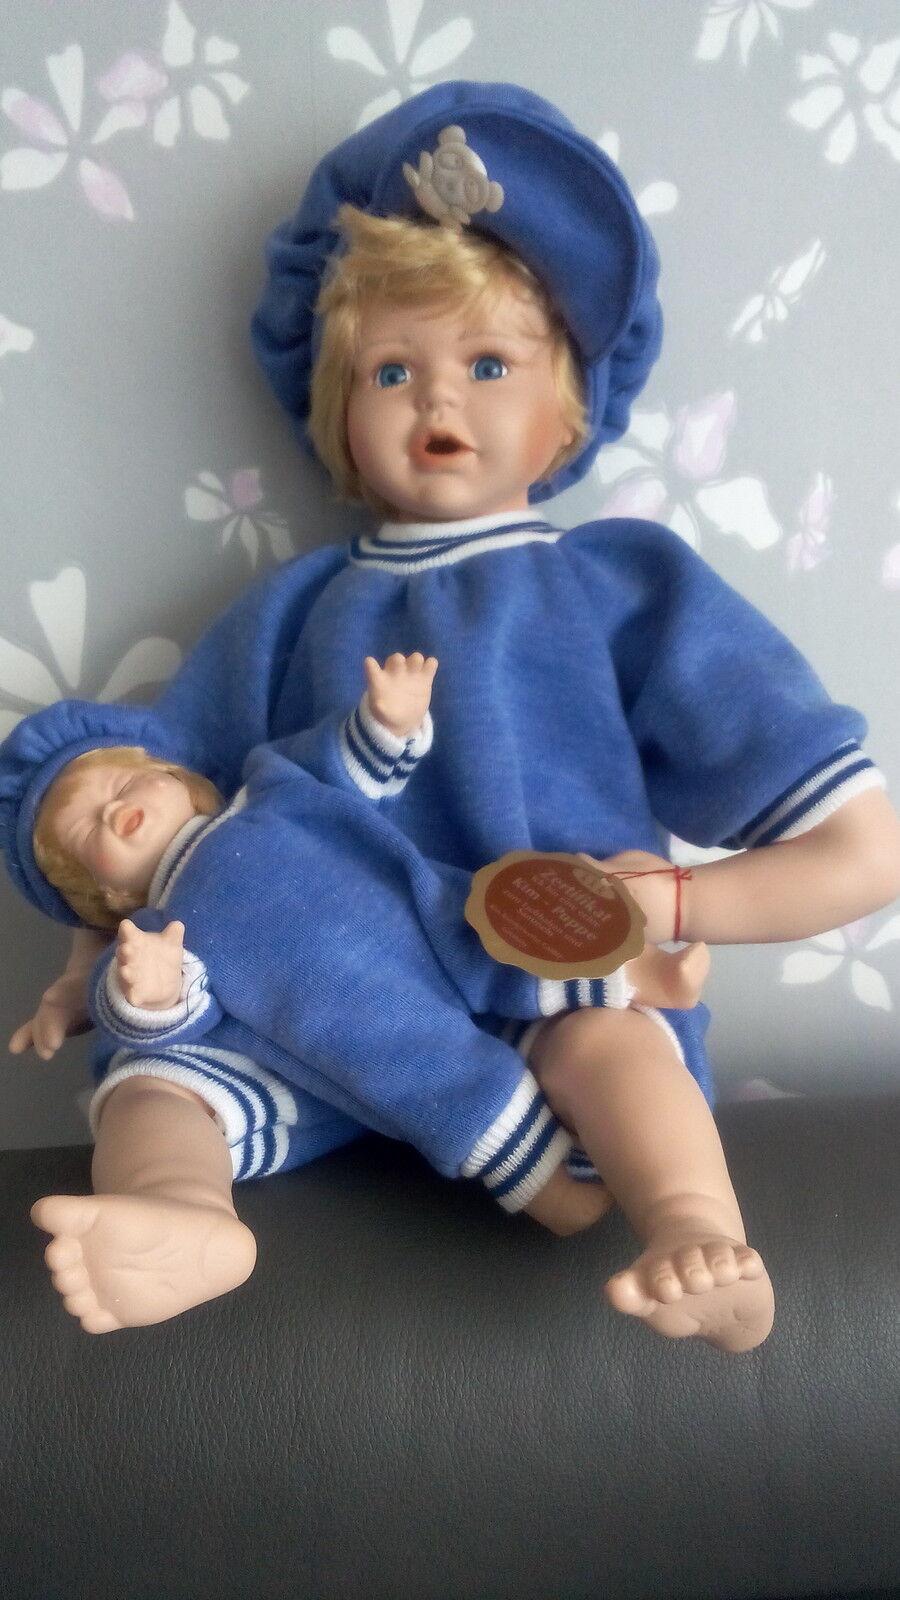 2 x Kim Puppe Pozellanpuppe Sammlerstück neu